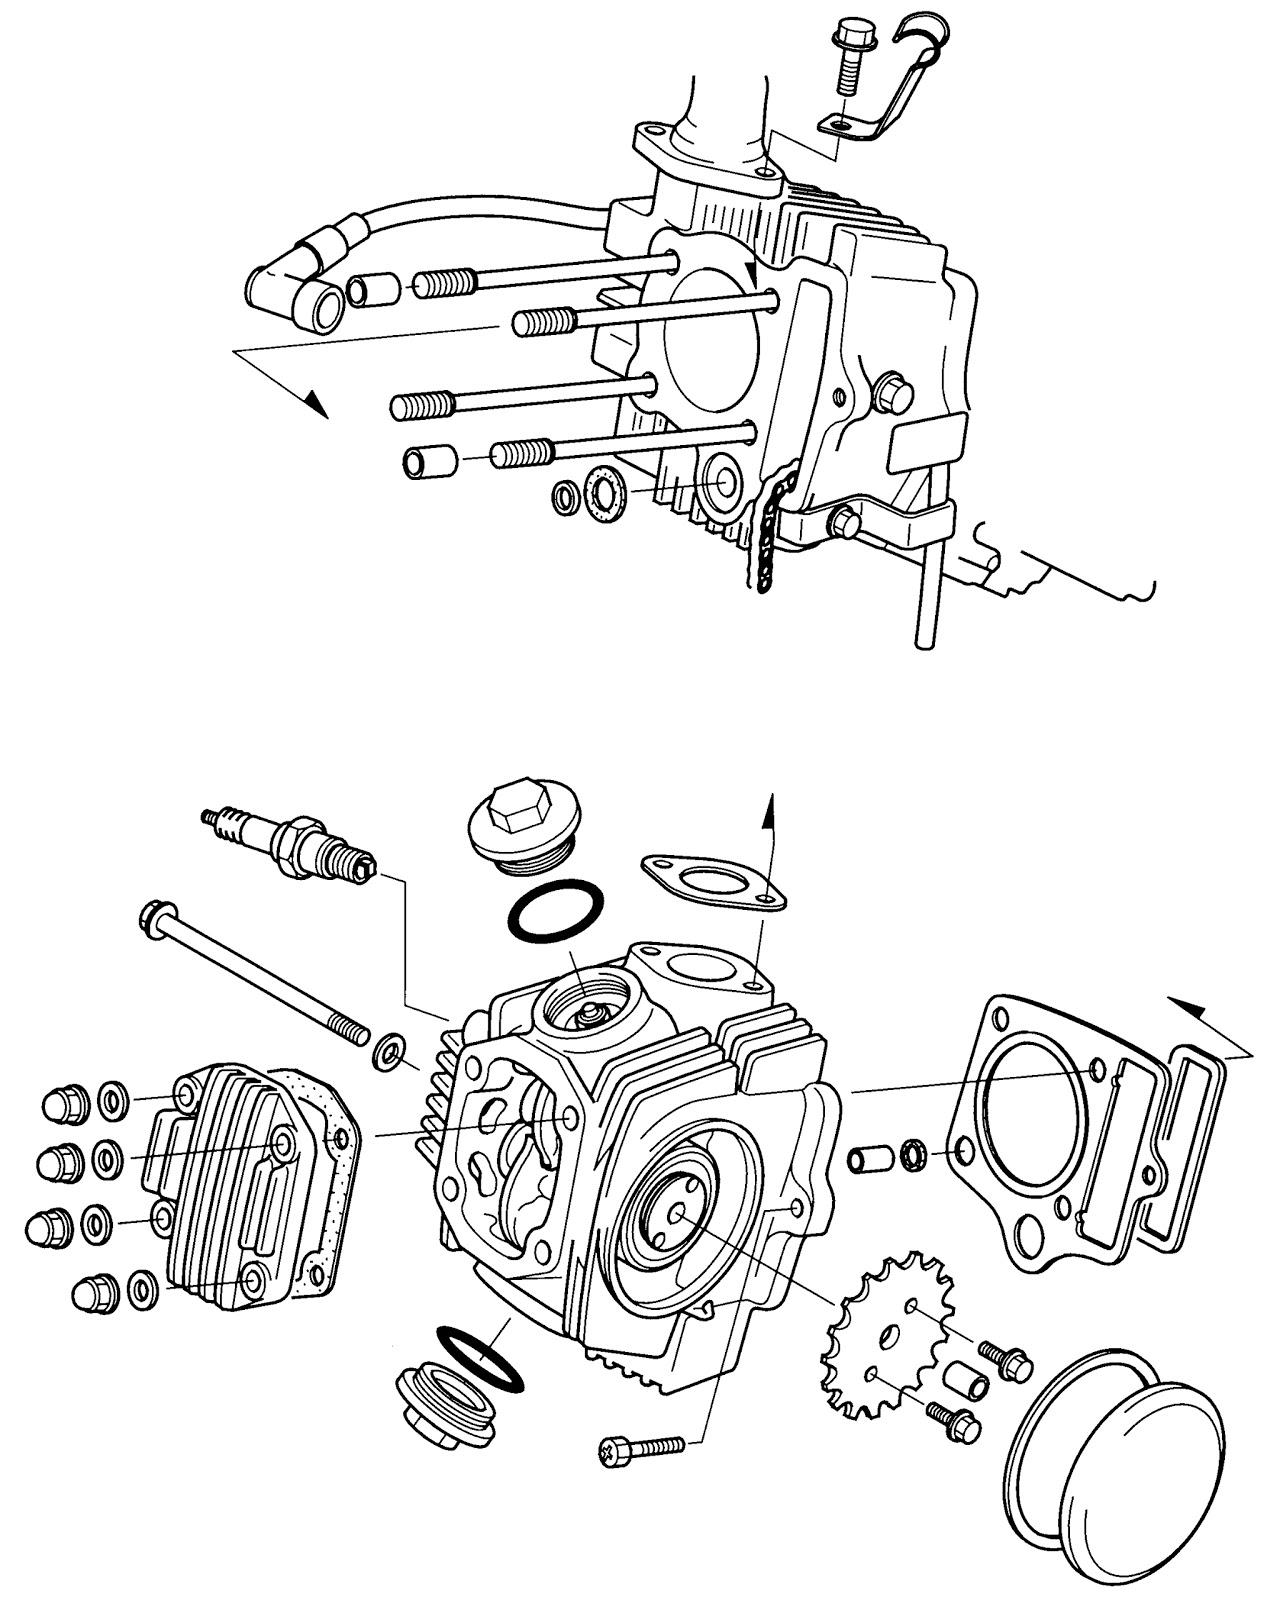 2013 honda pilot trailer wiring harness schematic honda pilot volvo s60 trailer wiring harness on 2013 honda pilot trailer wiring harness schematic